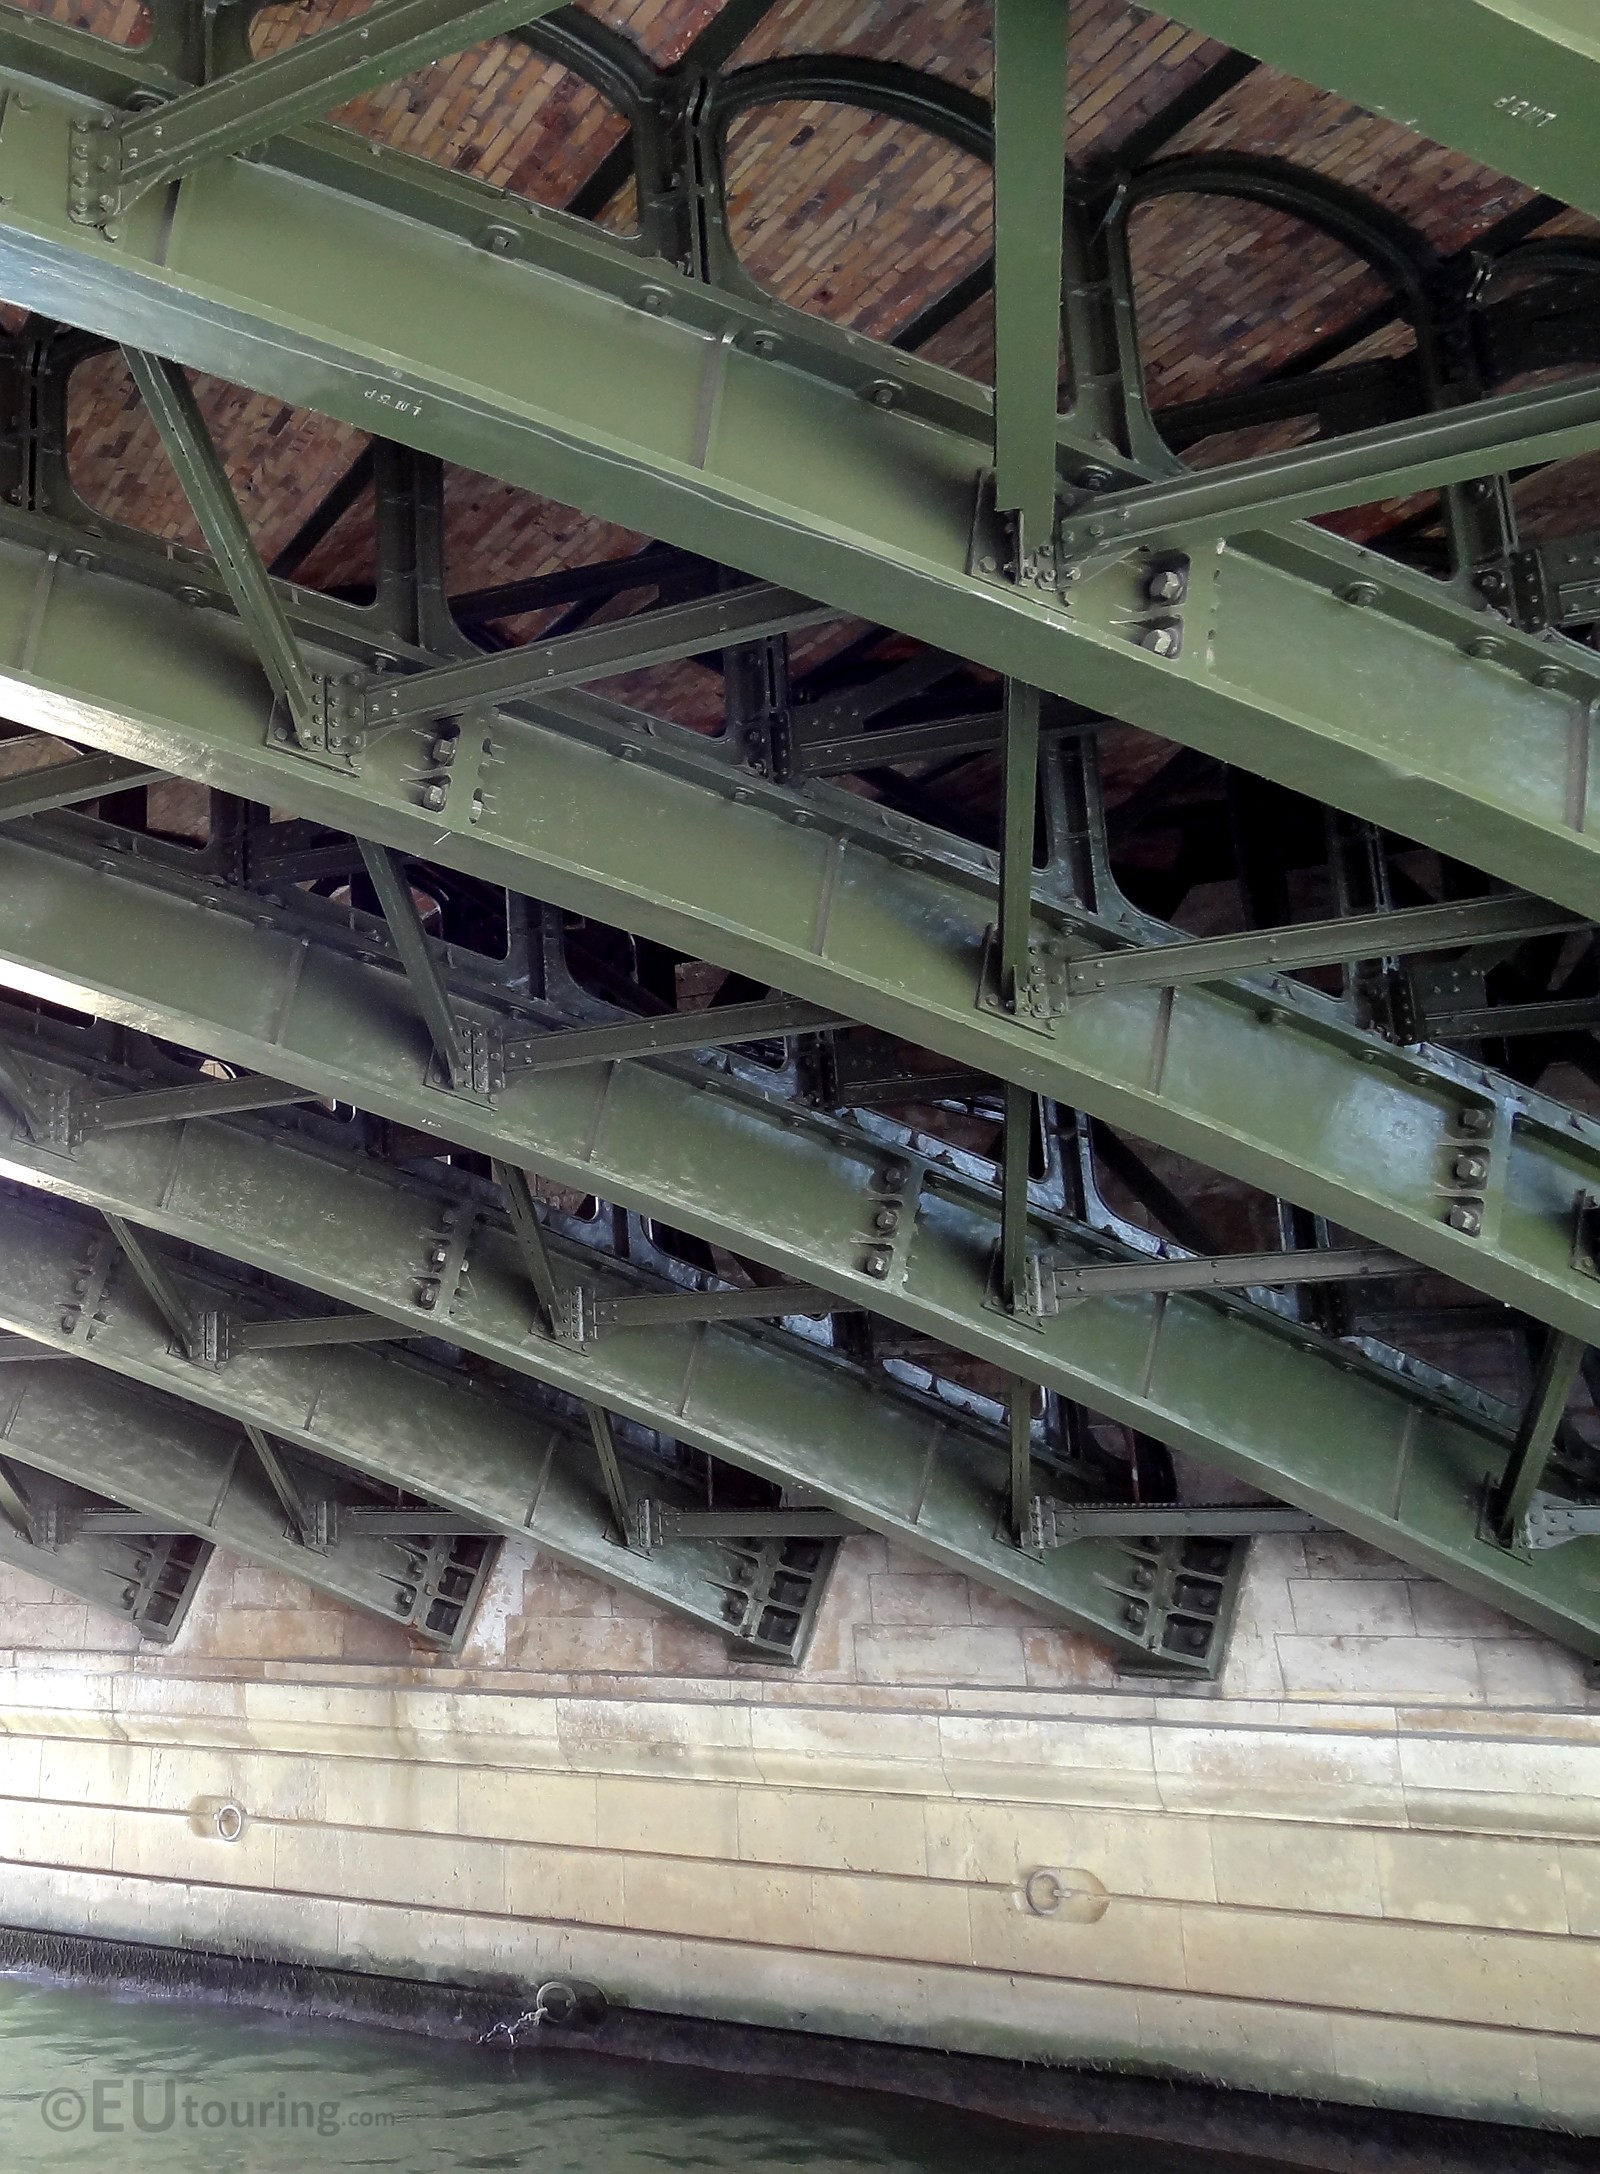 Metal beneath the Pont de Sully